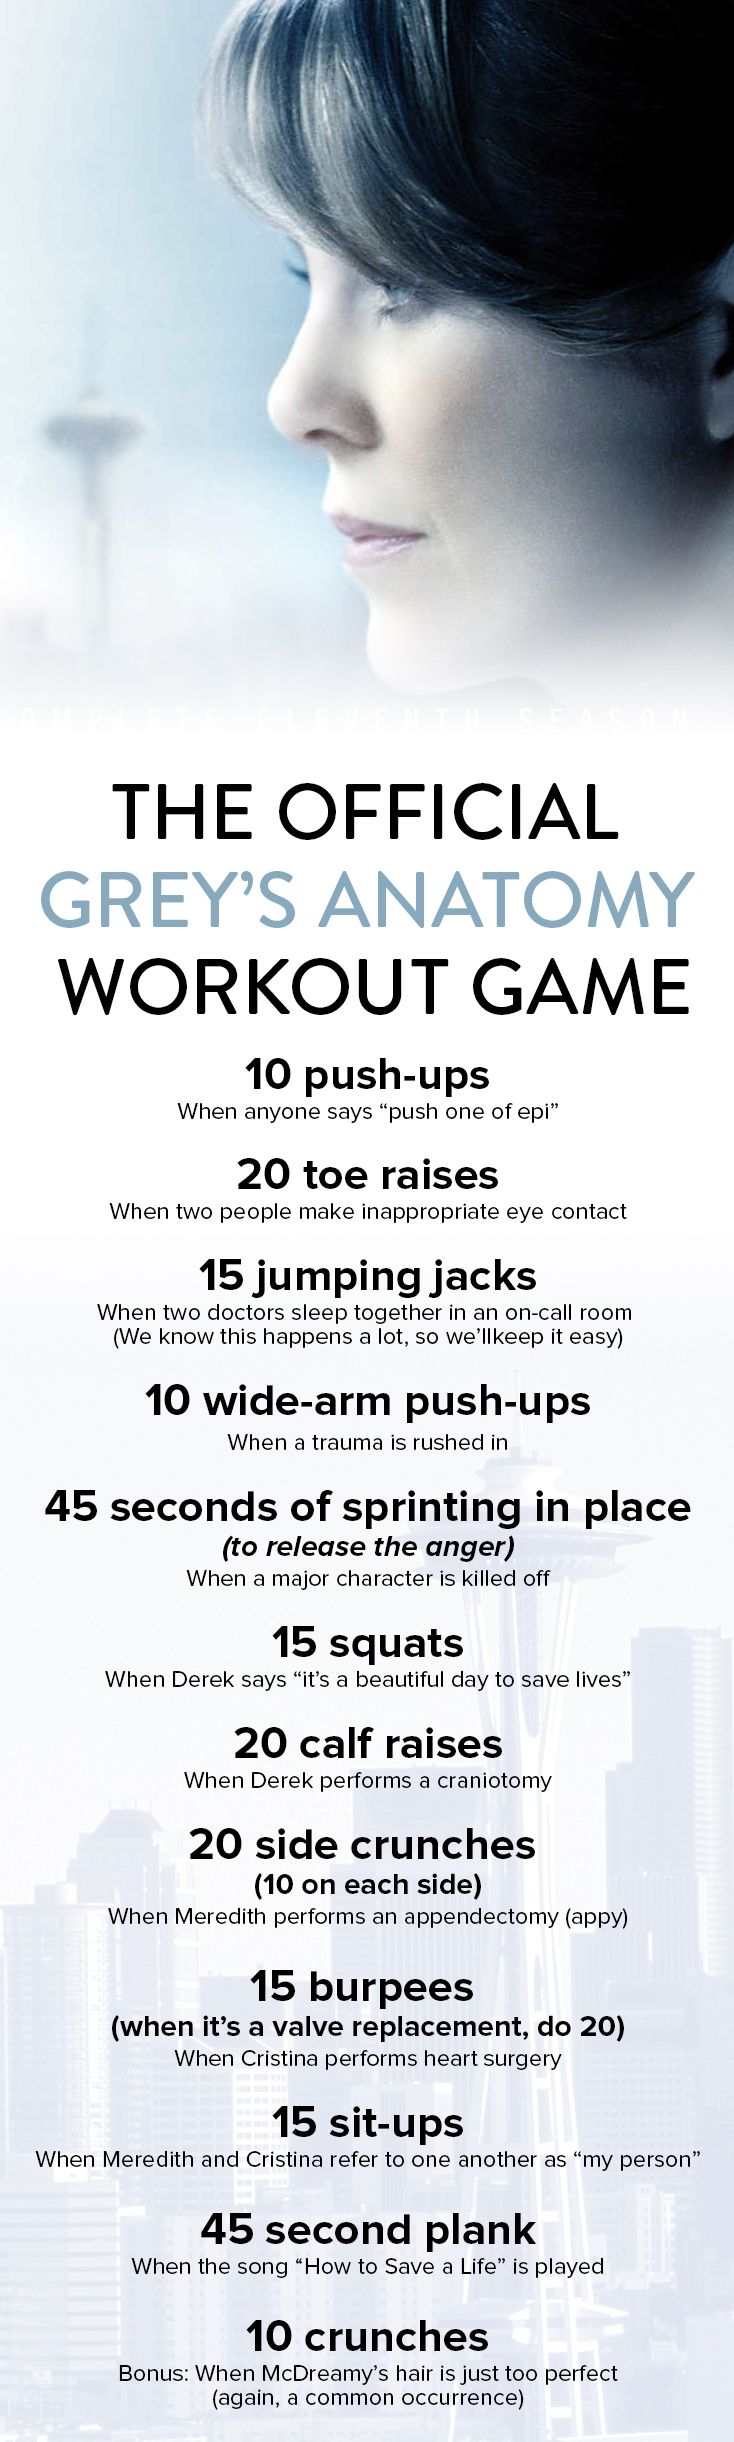 Greys Anatomy Challenge - Budra